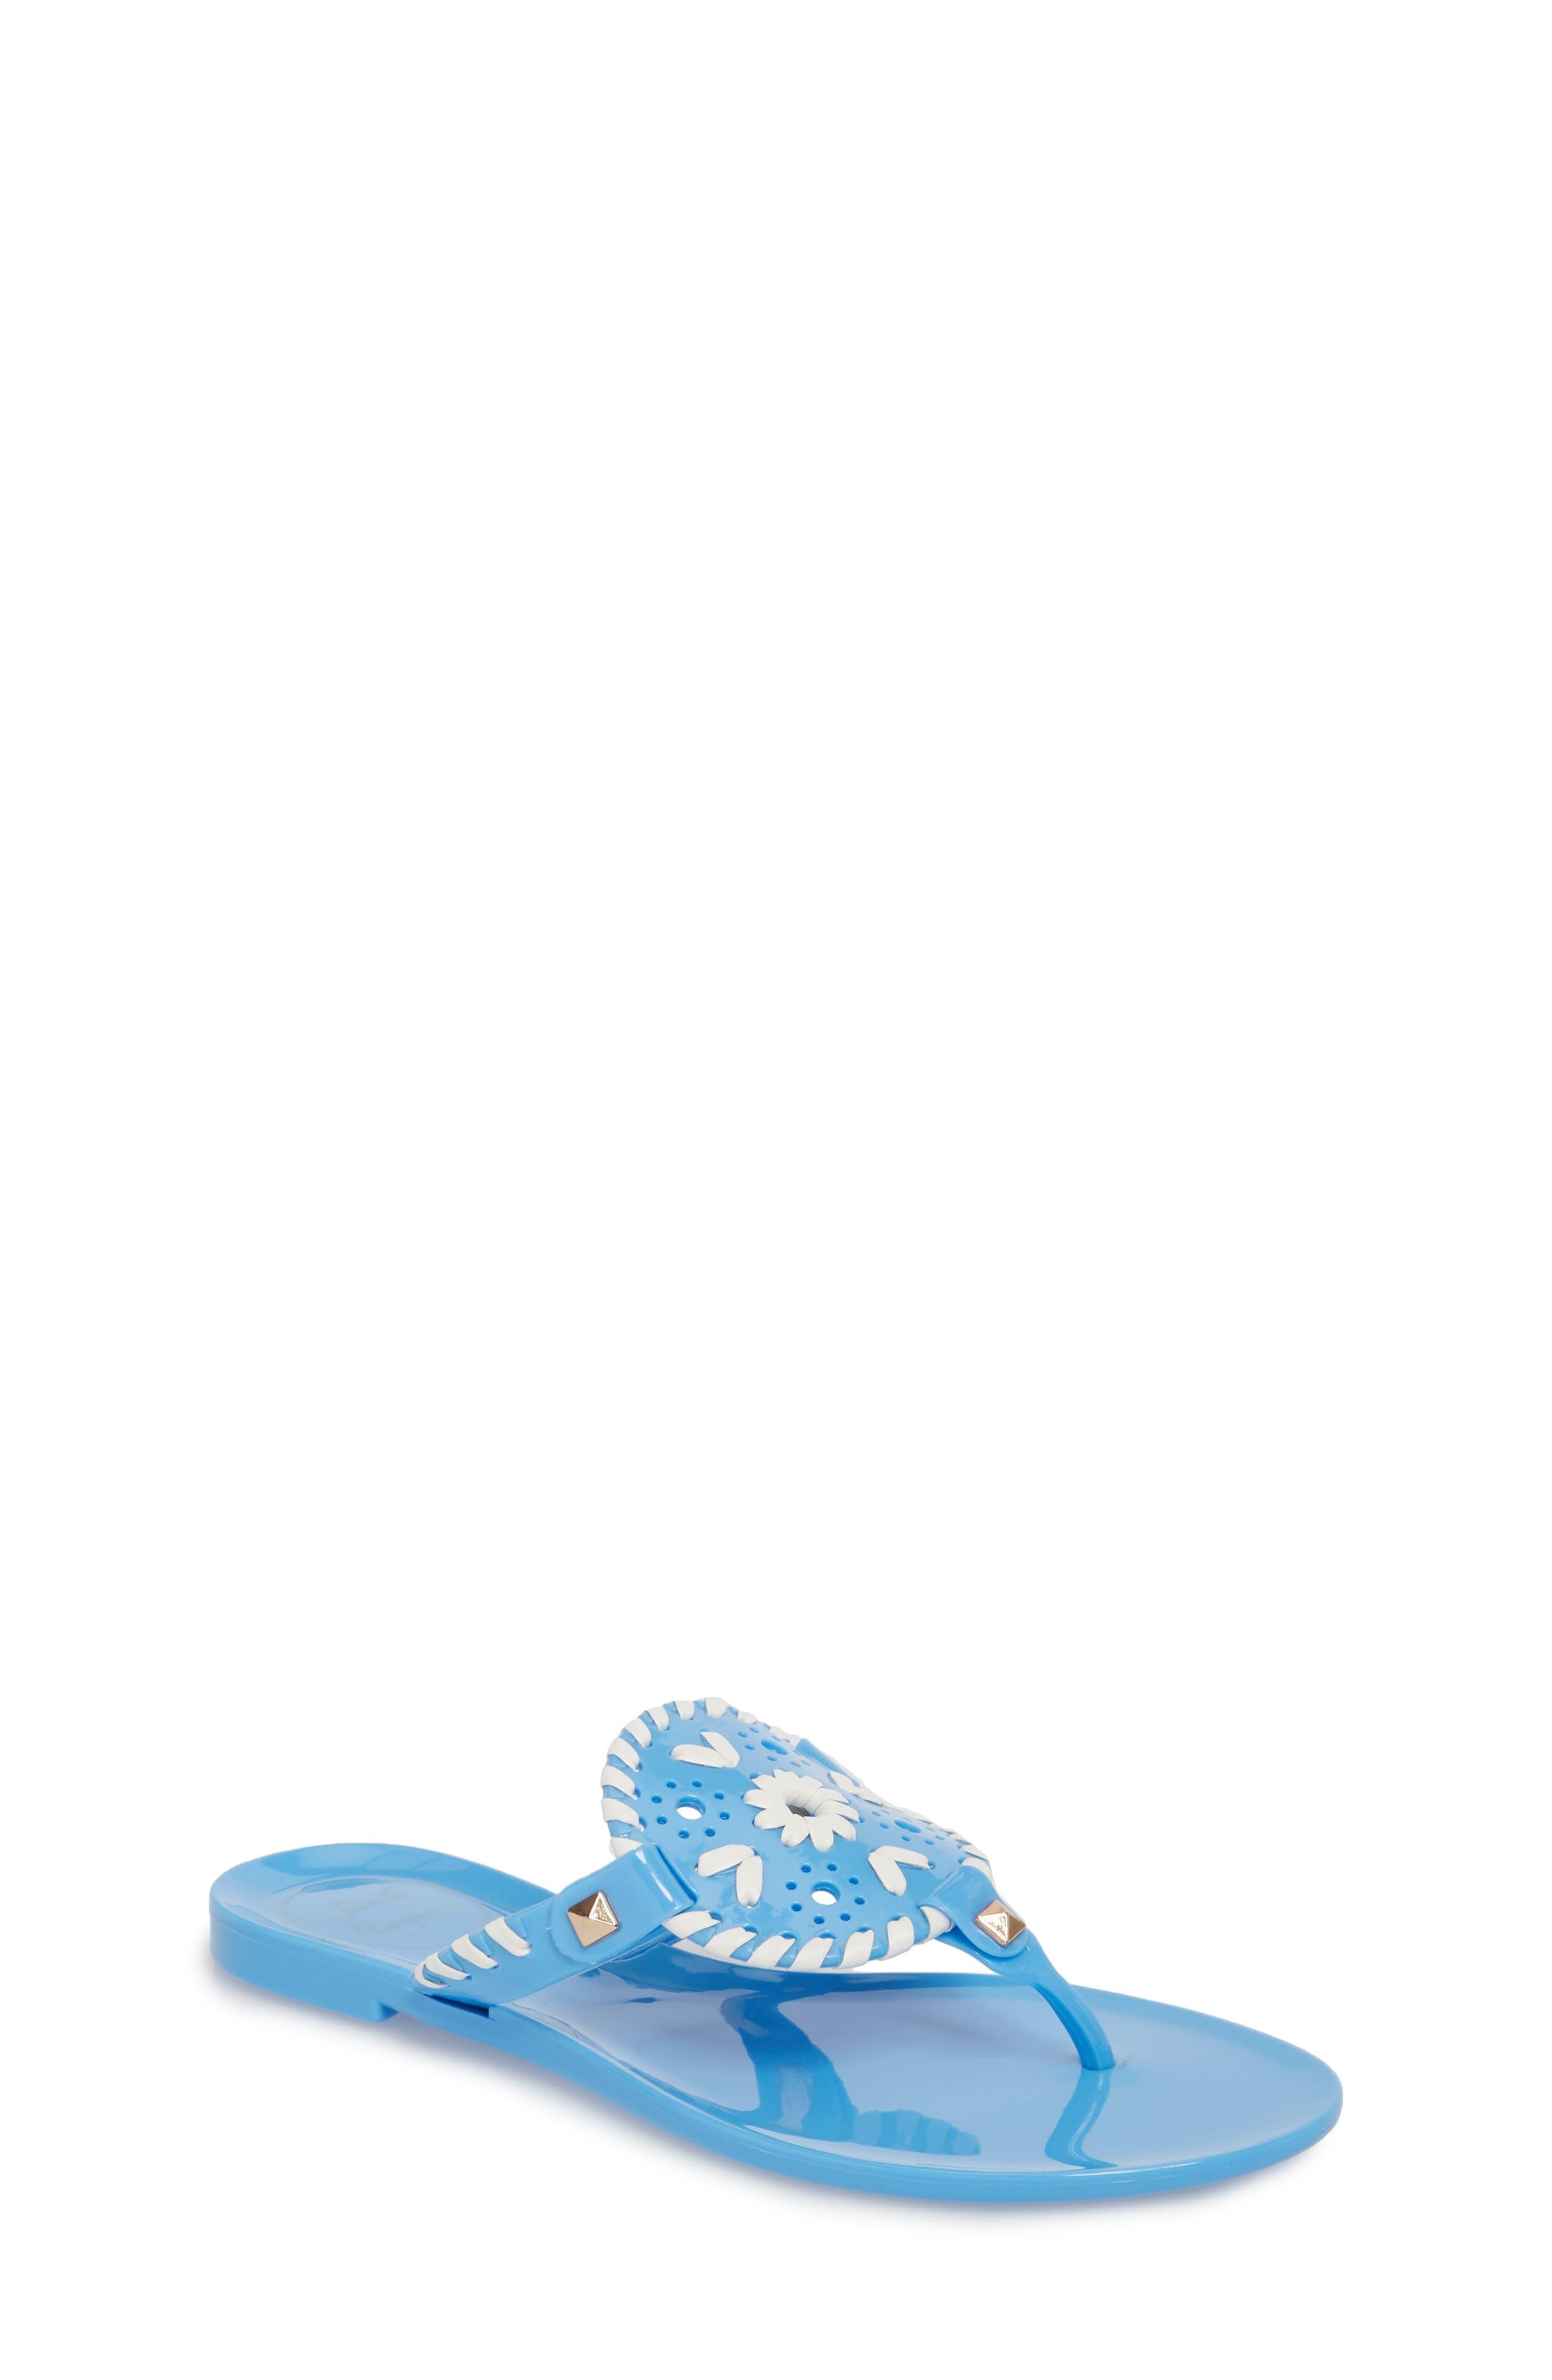 Alternate Image 1 Selected - Jack Rogers 'Miss Georgica' Jelly Flip Flop (Walker, Toddler, Little Kid & Big Kid)